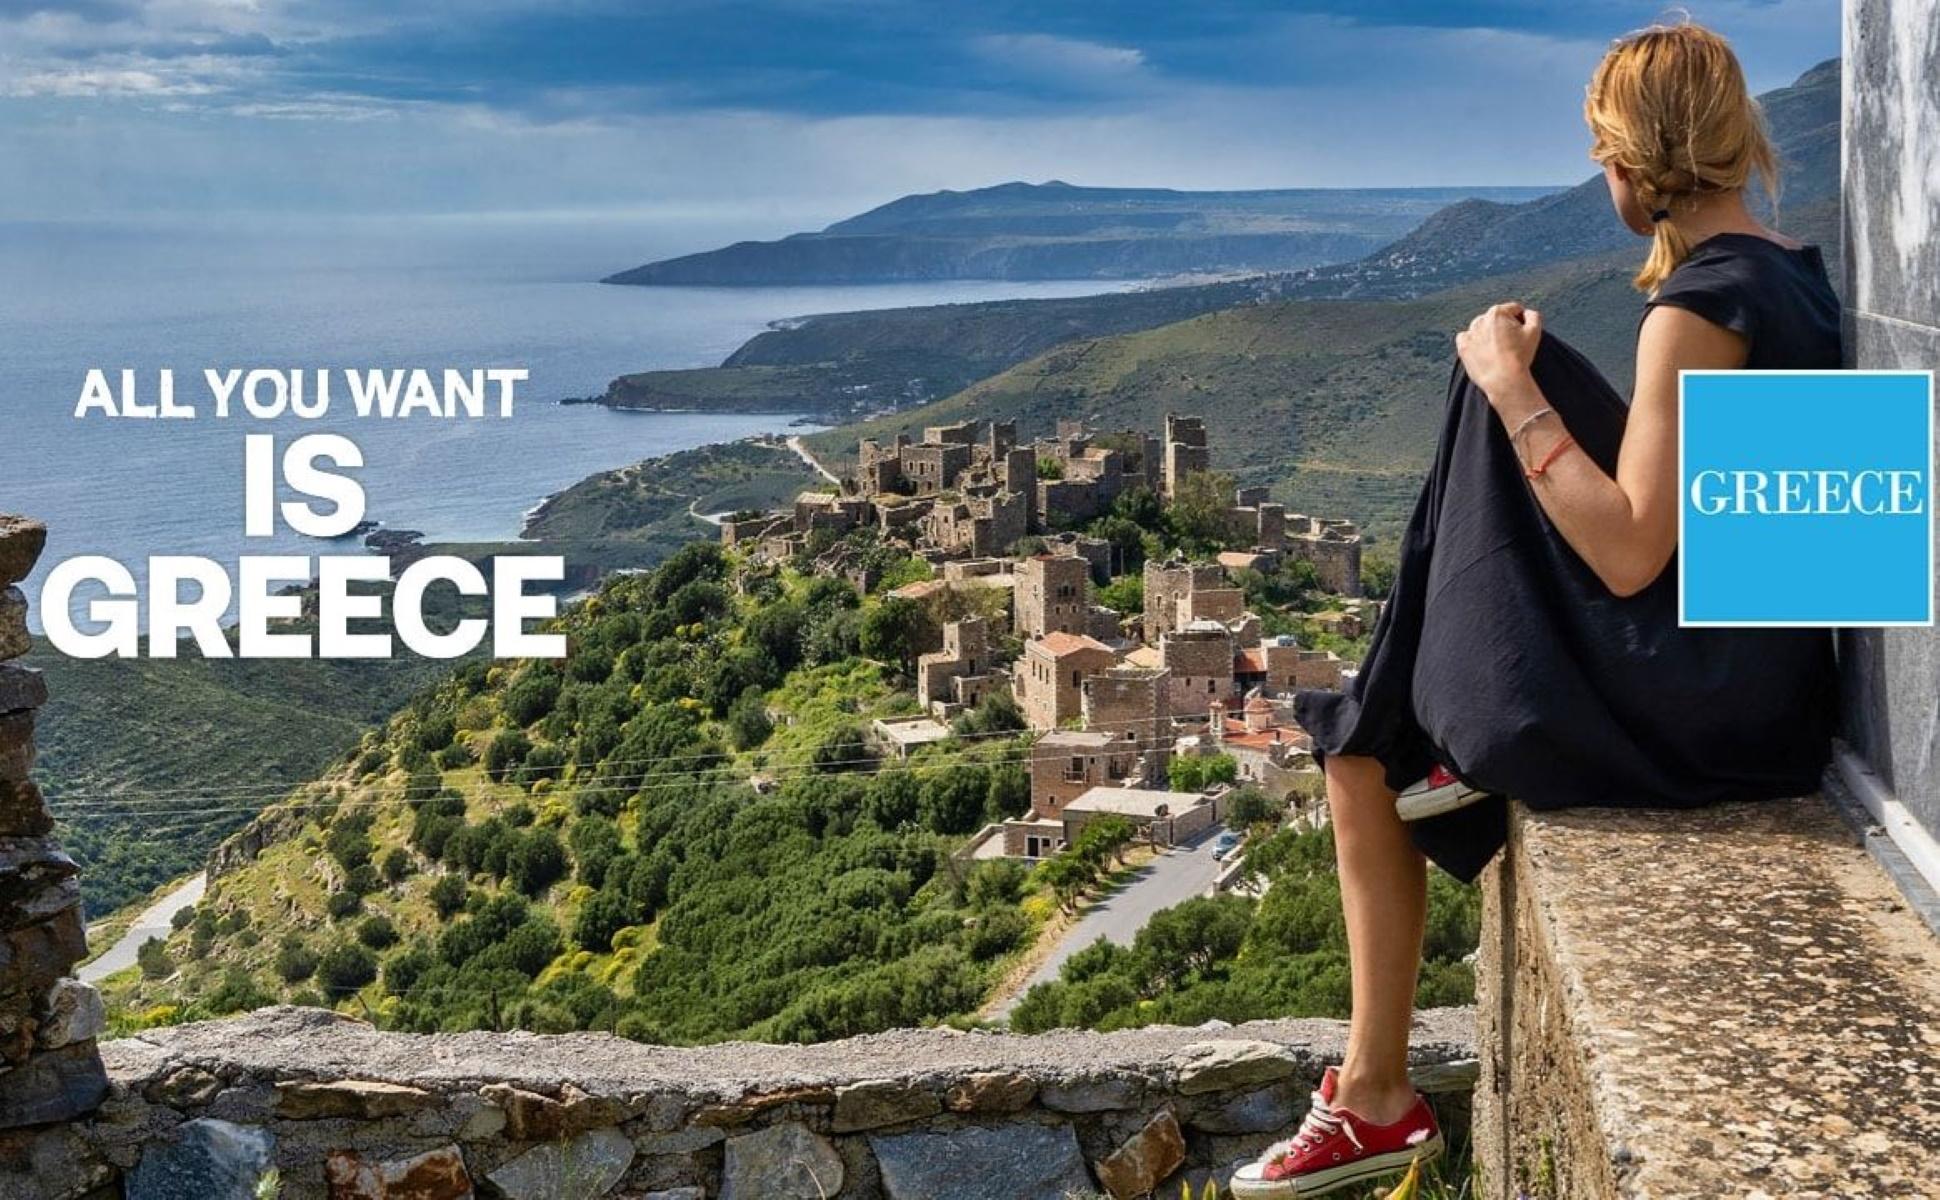 «All you want is Greece»: Στόχος να ανοίξει ο τουρισμός μέχρι τις 14 Μαΐου